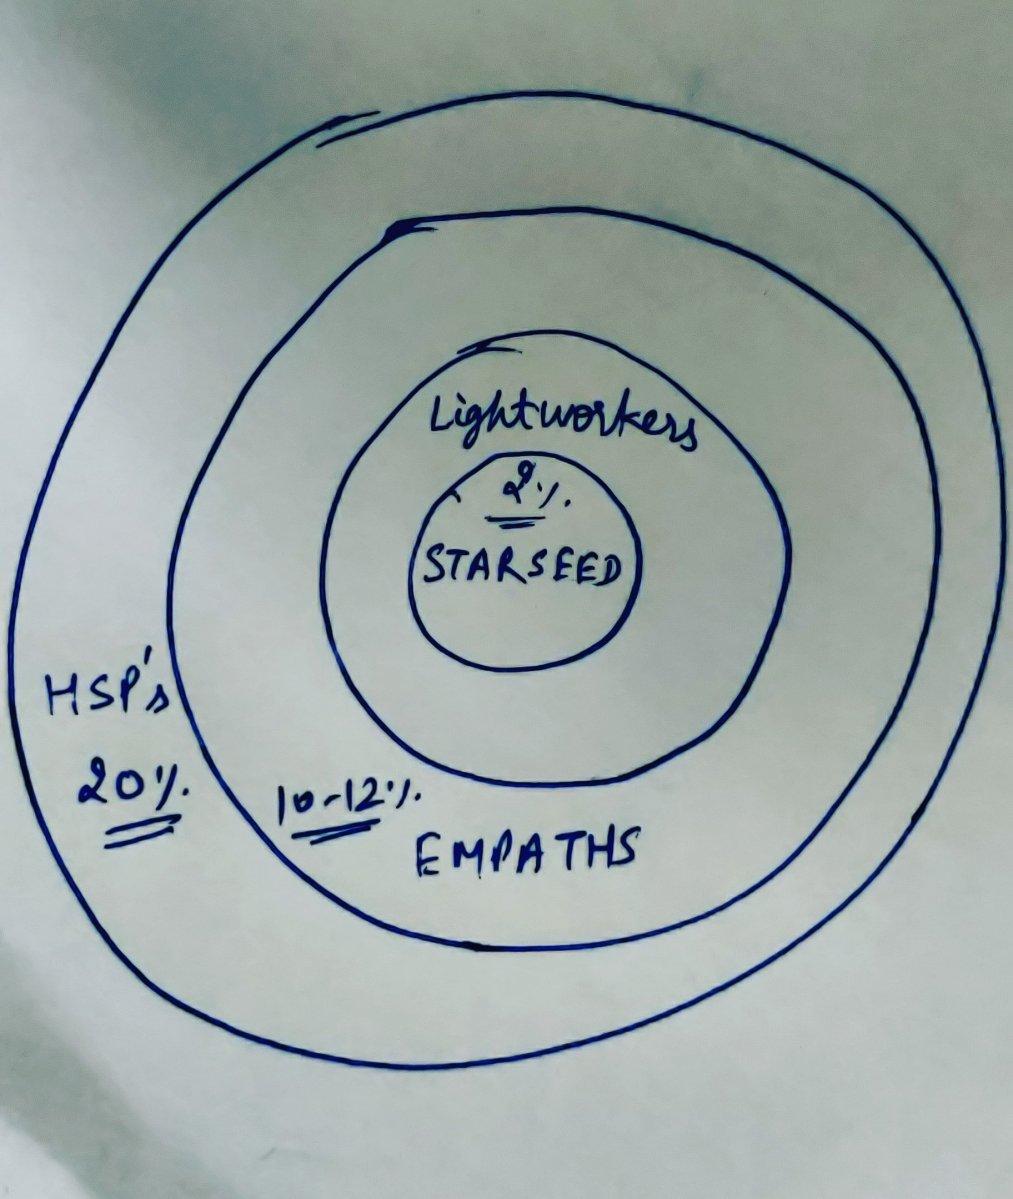 Venn Diagram To Explain Spirituality  U2013 The Pretty Smart Techie